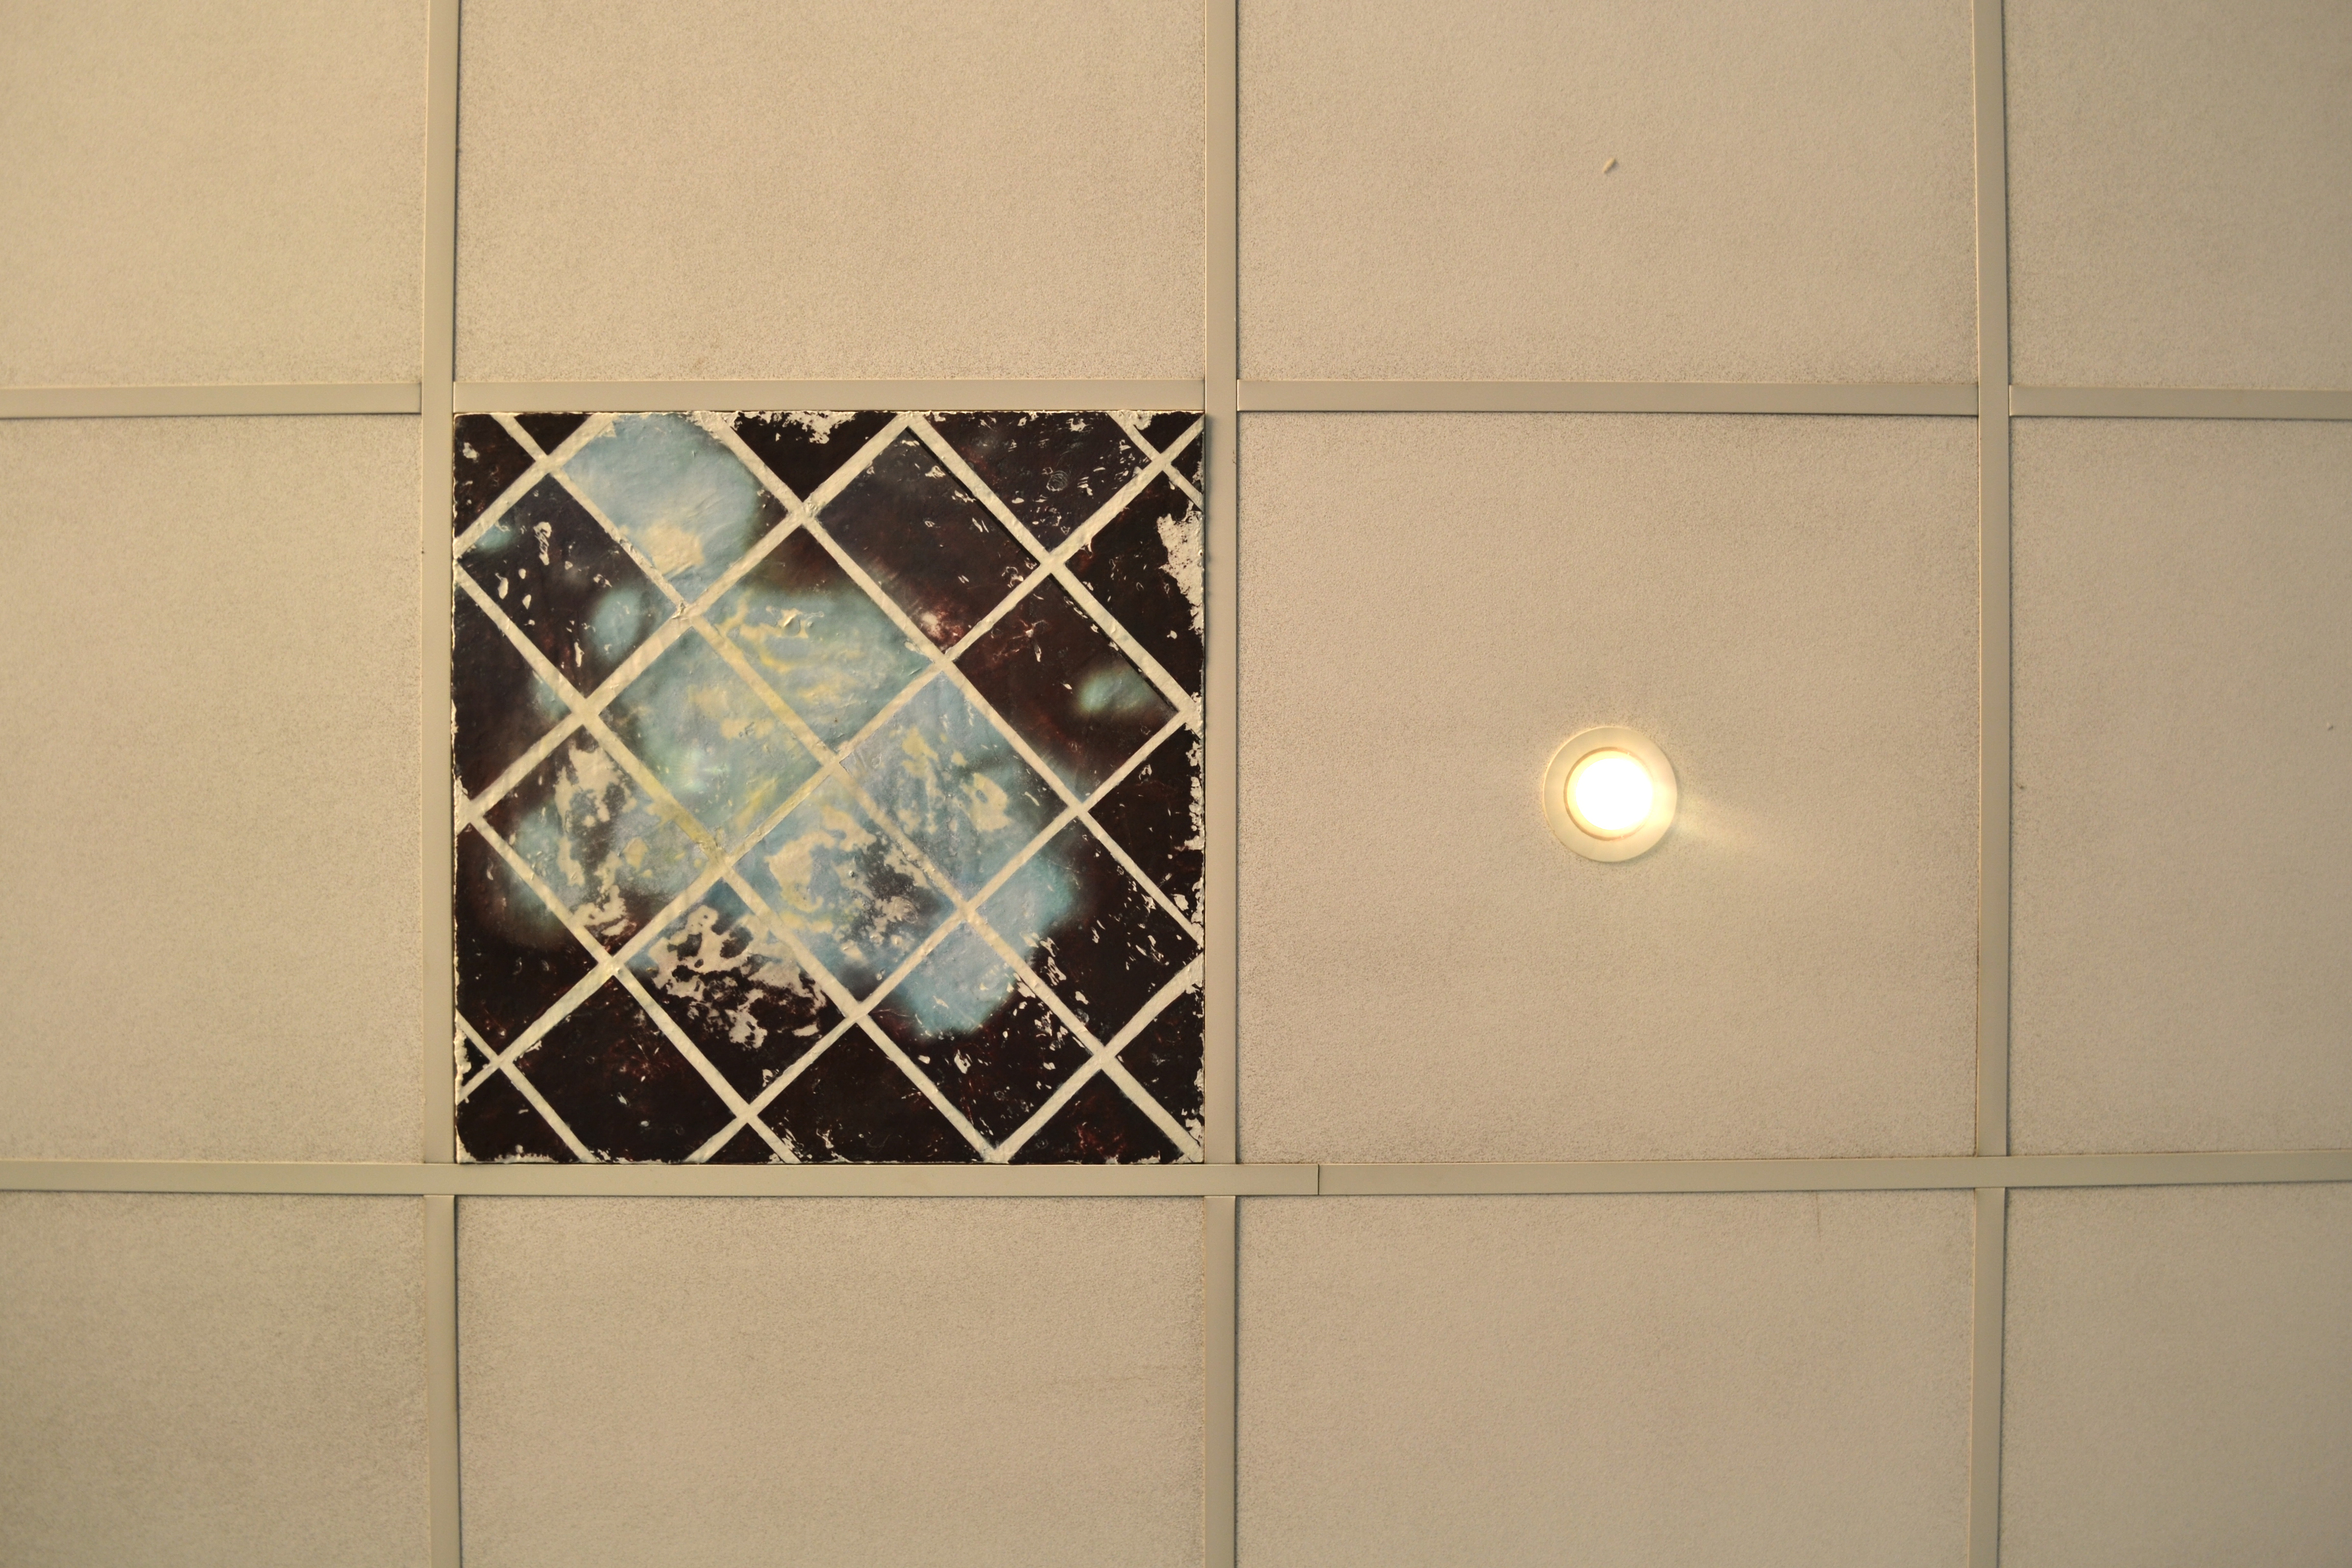 16x32 ceiling tiles